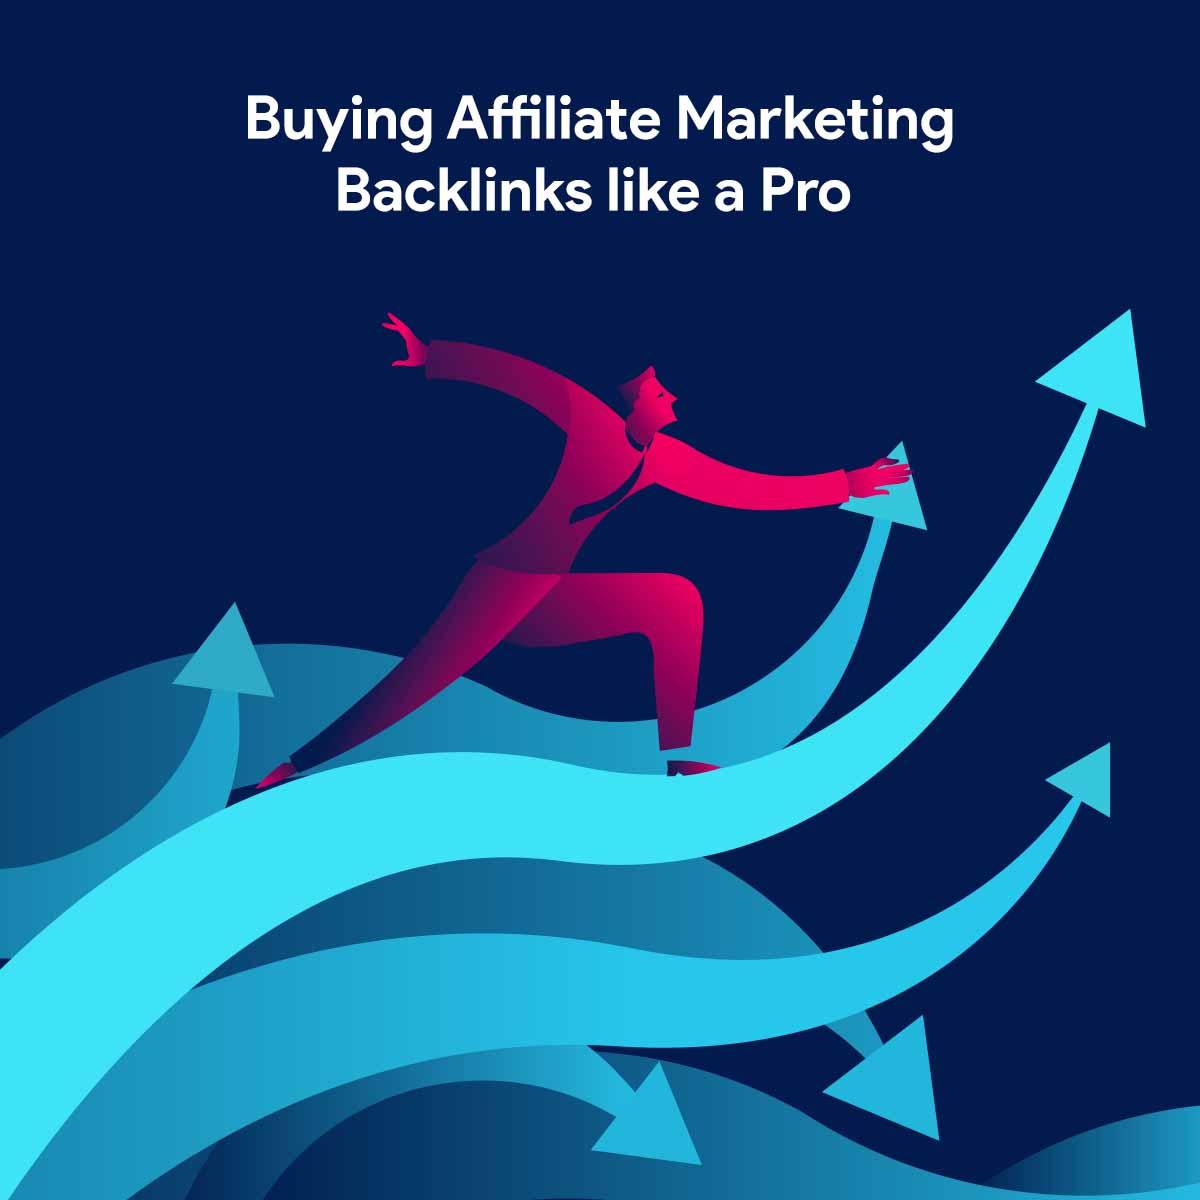 eBook - Buying Affiliate Marketing Backlinks like a Pro